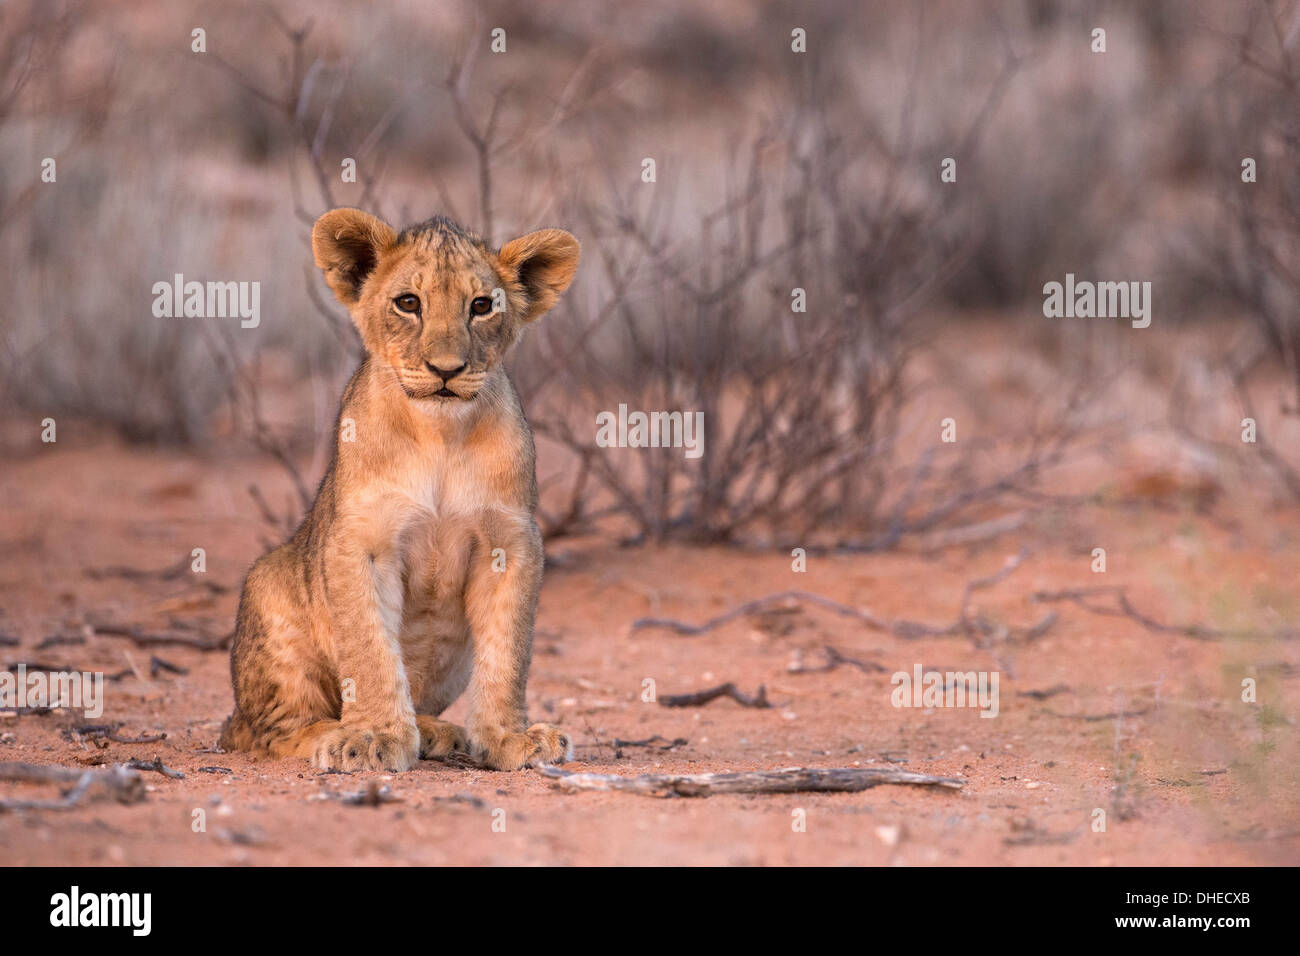 Löwenjunges (Panthera Leo), Kgalagadi Transfrontier Park, Südafrika, Afrika Stockbild